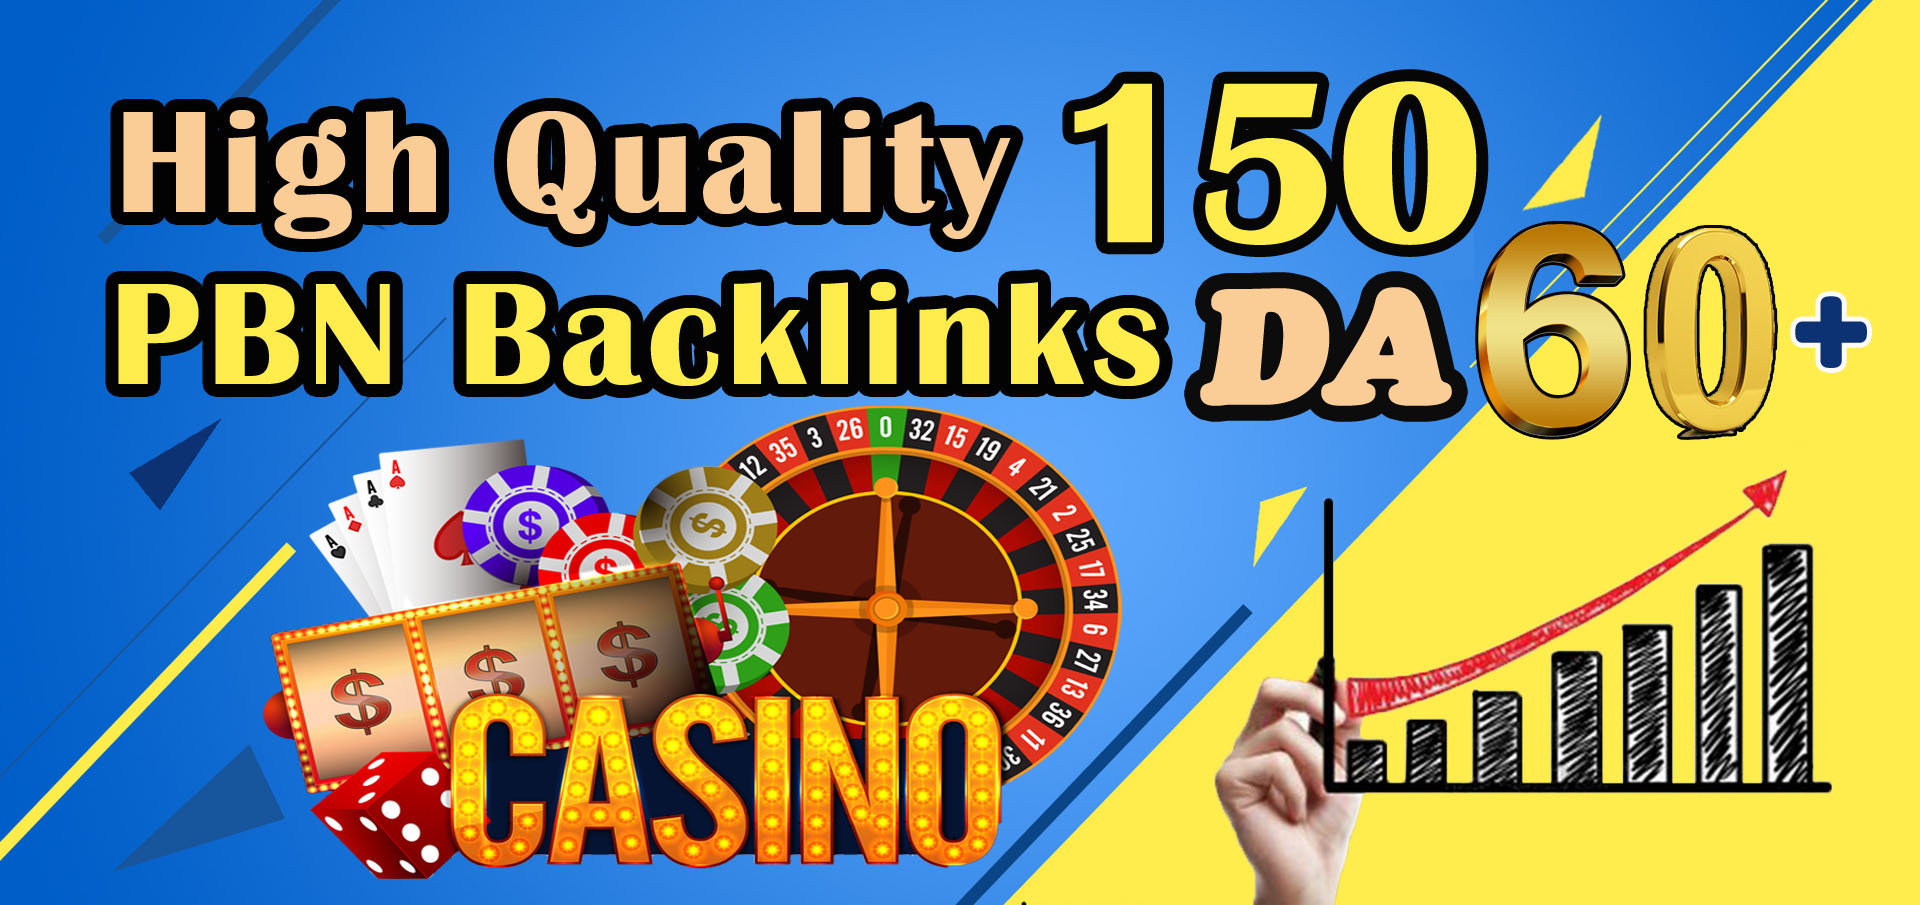 Get 150 High Quality DA 60+ Casino Gambling poker homepage pbn backlinks and judi related sites.